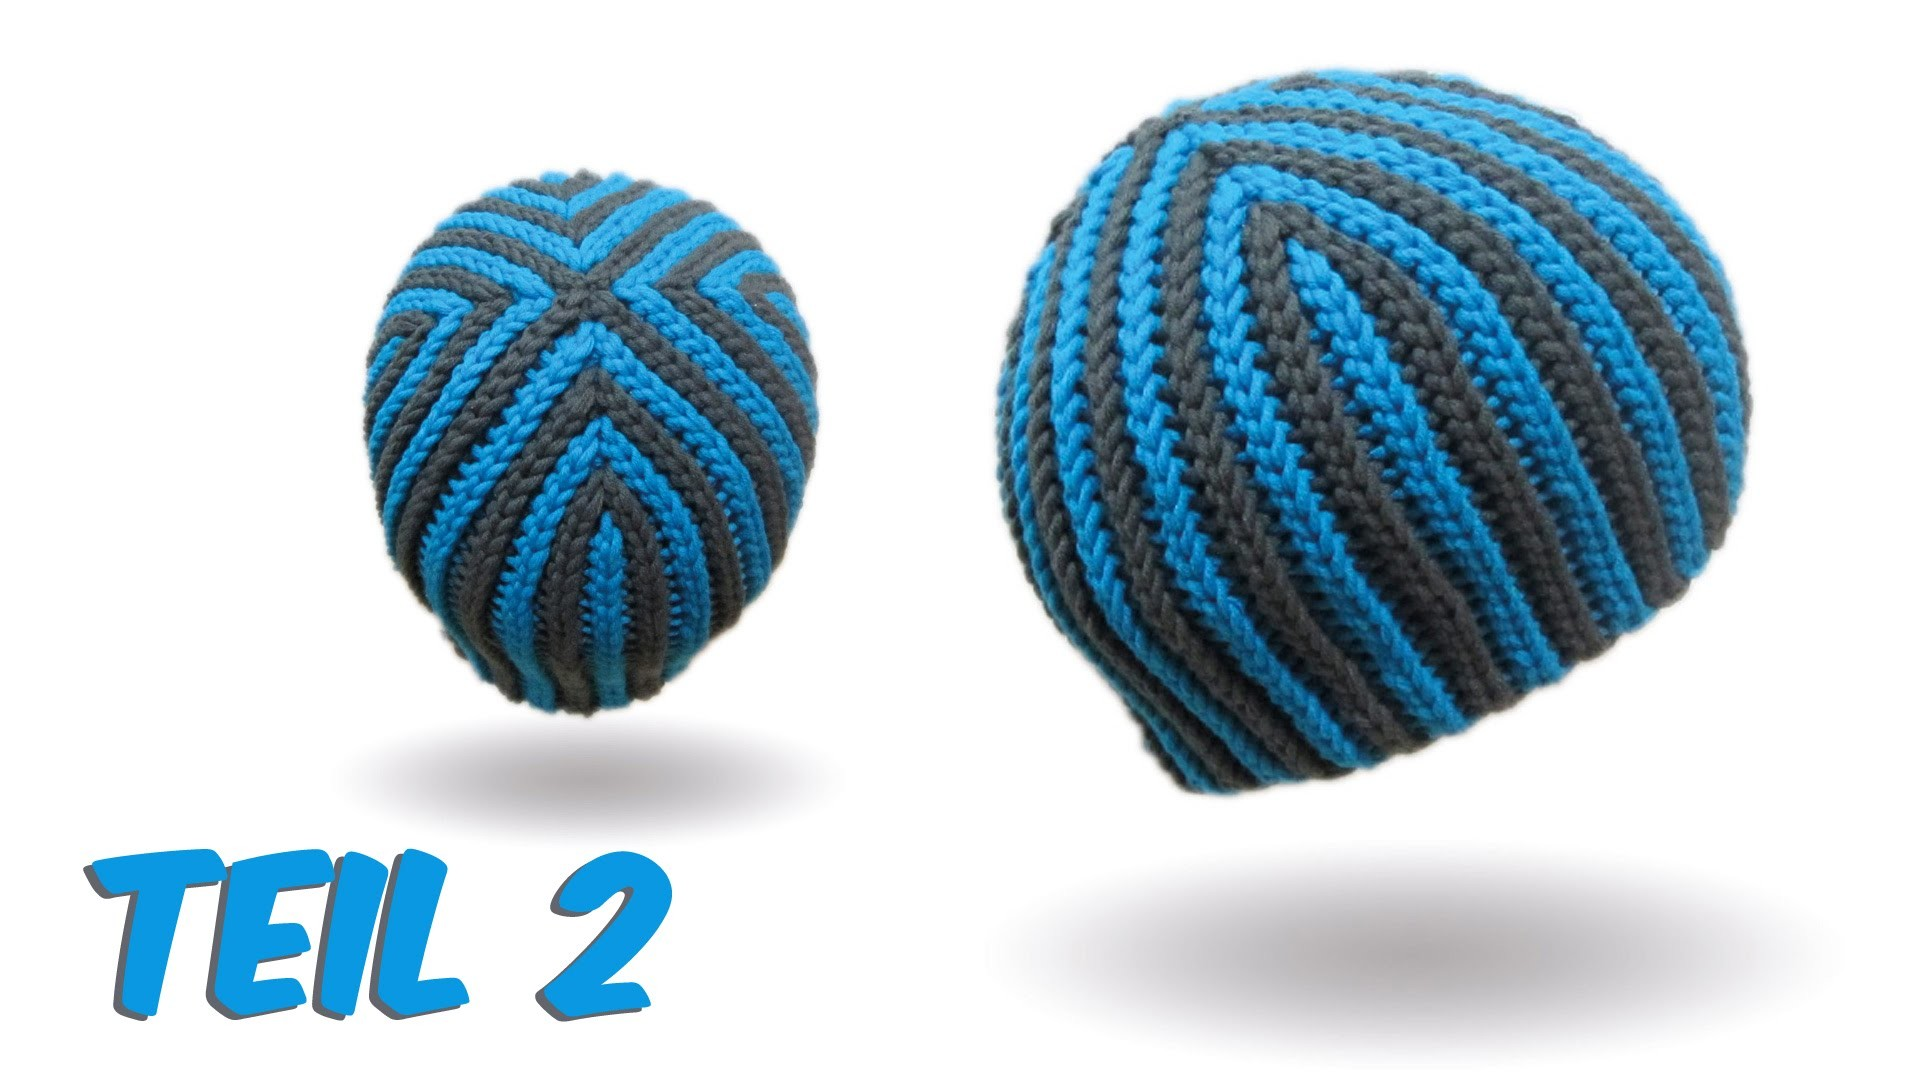 Mütze bosnisch häkeln - Hazelnut Beanie Teil 2 - Kettmaschen häkeln